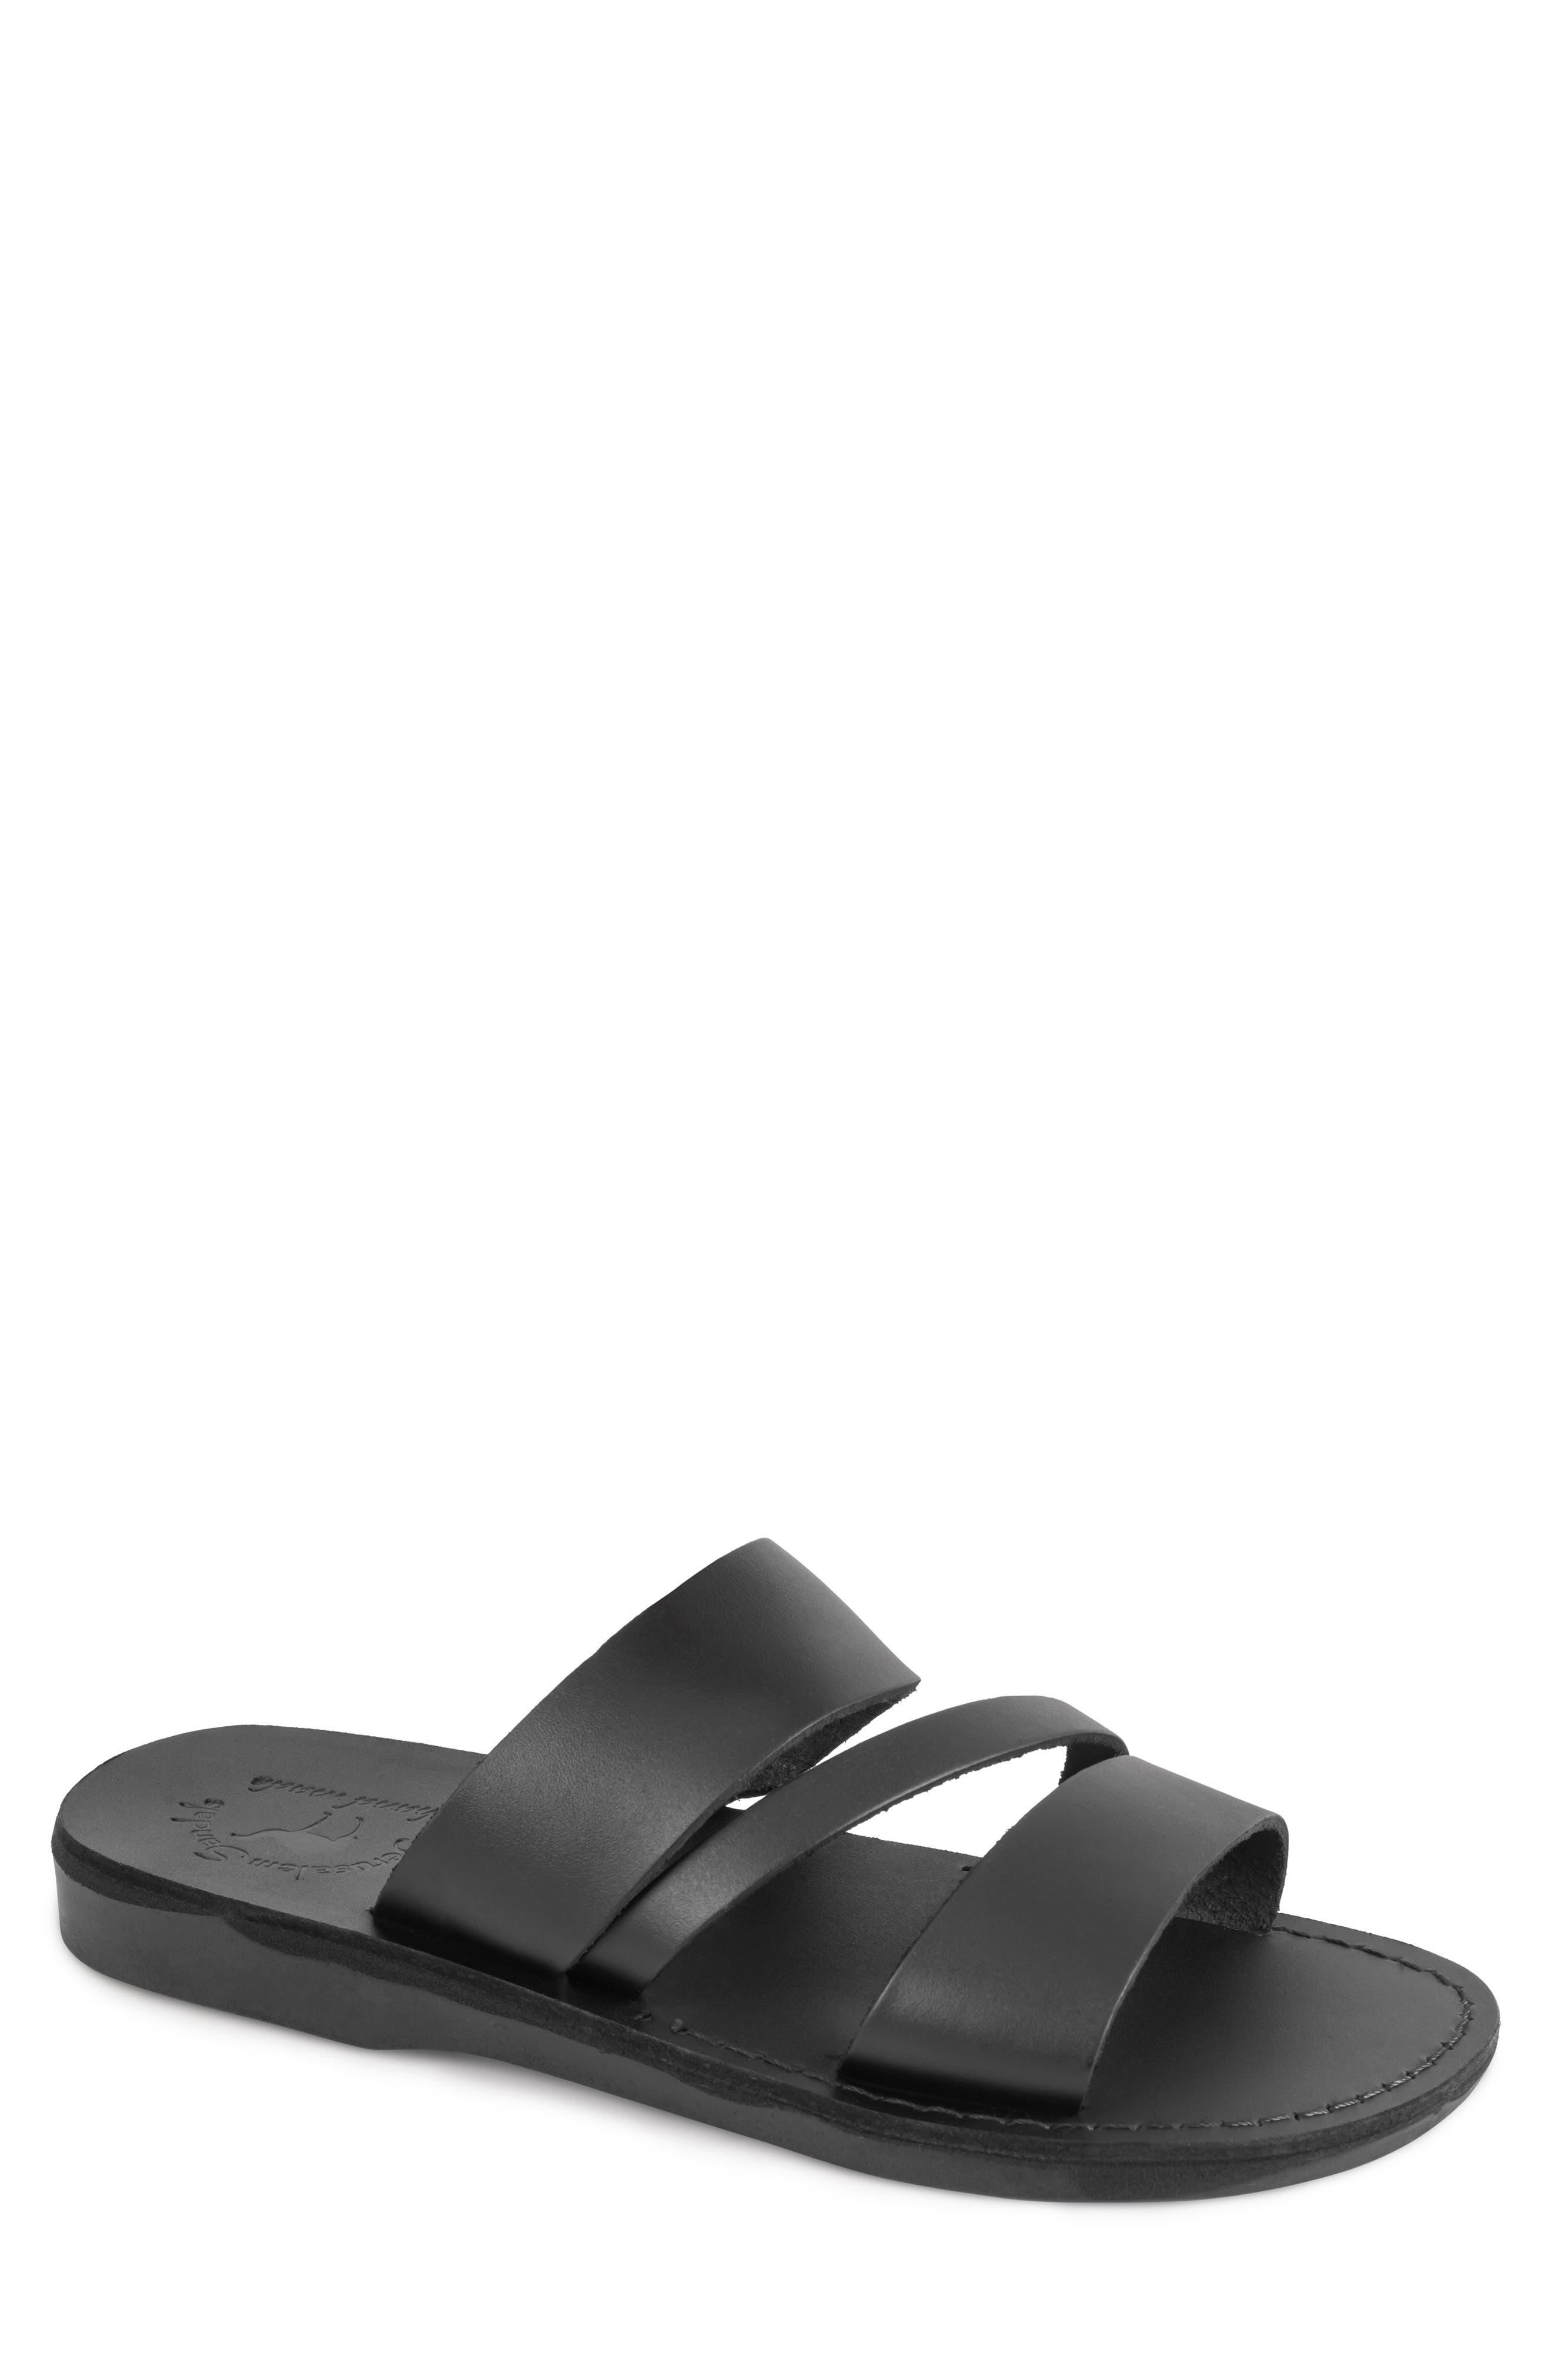 Boaz Water Resistant Slide Sandal